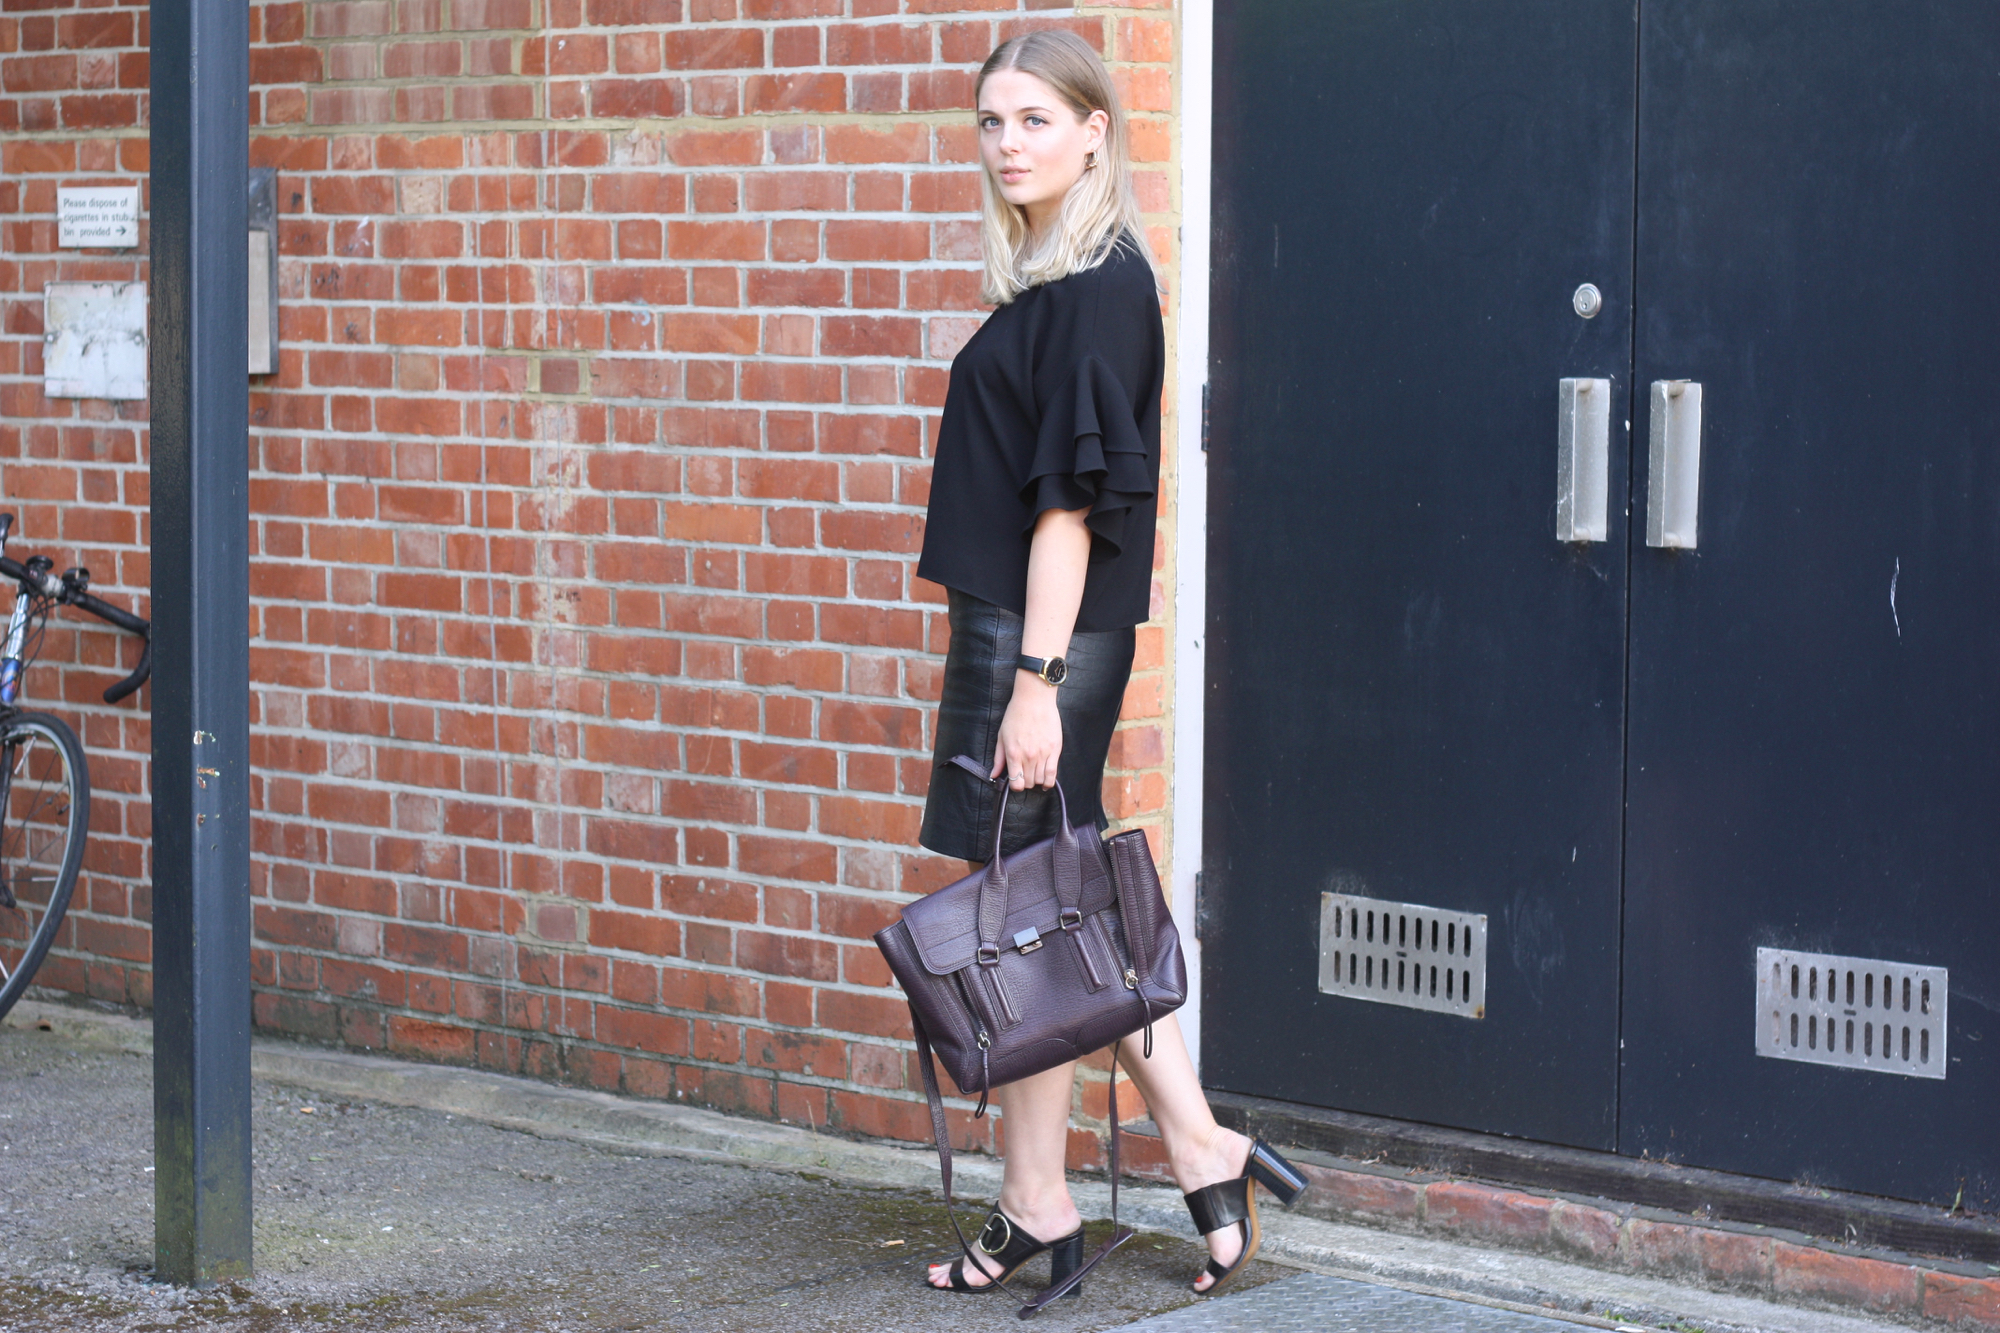 Whistles Fairhope buckle sandals, 3.1 Phillip Lim Pashli medium burgundy and Zara black ruffle top